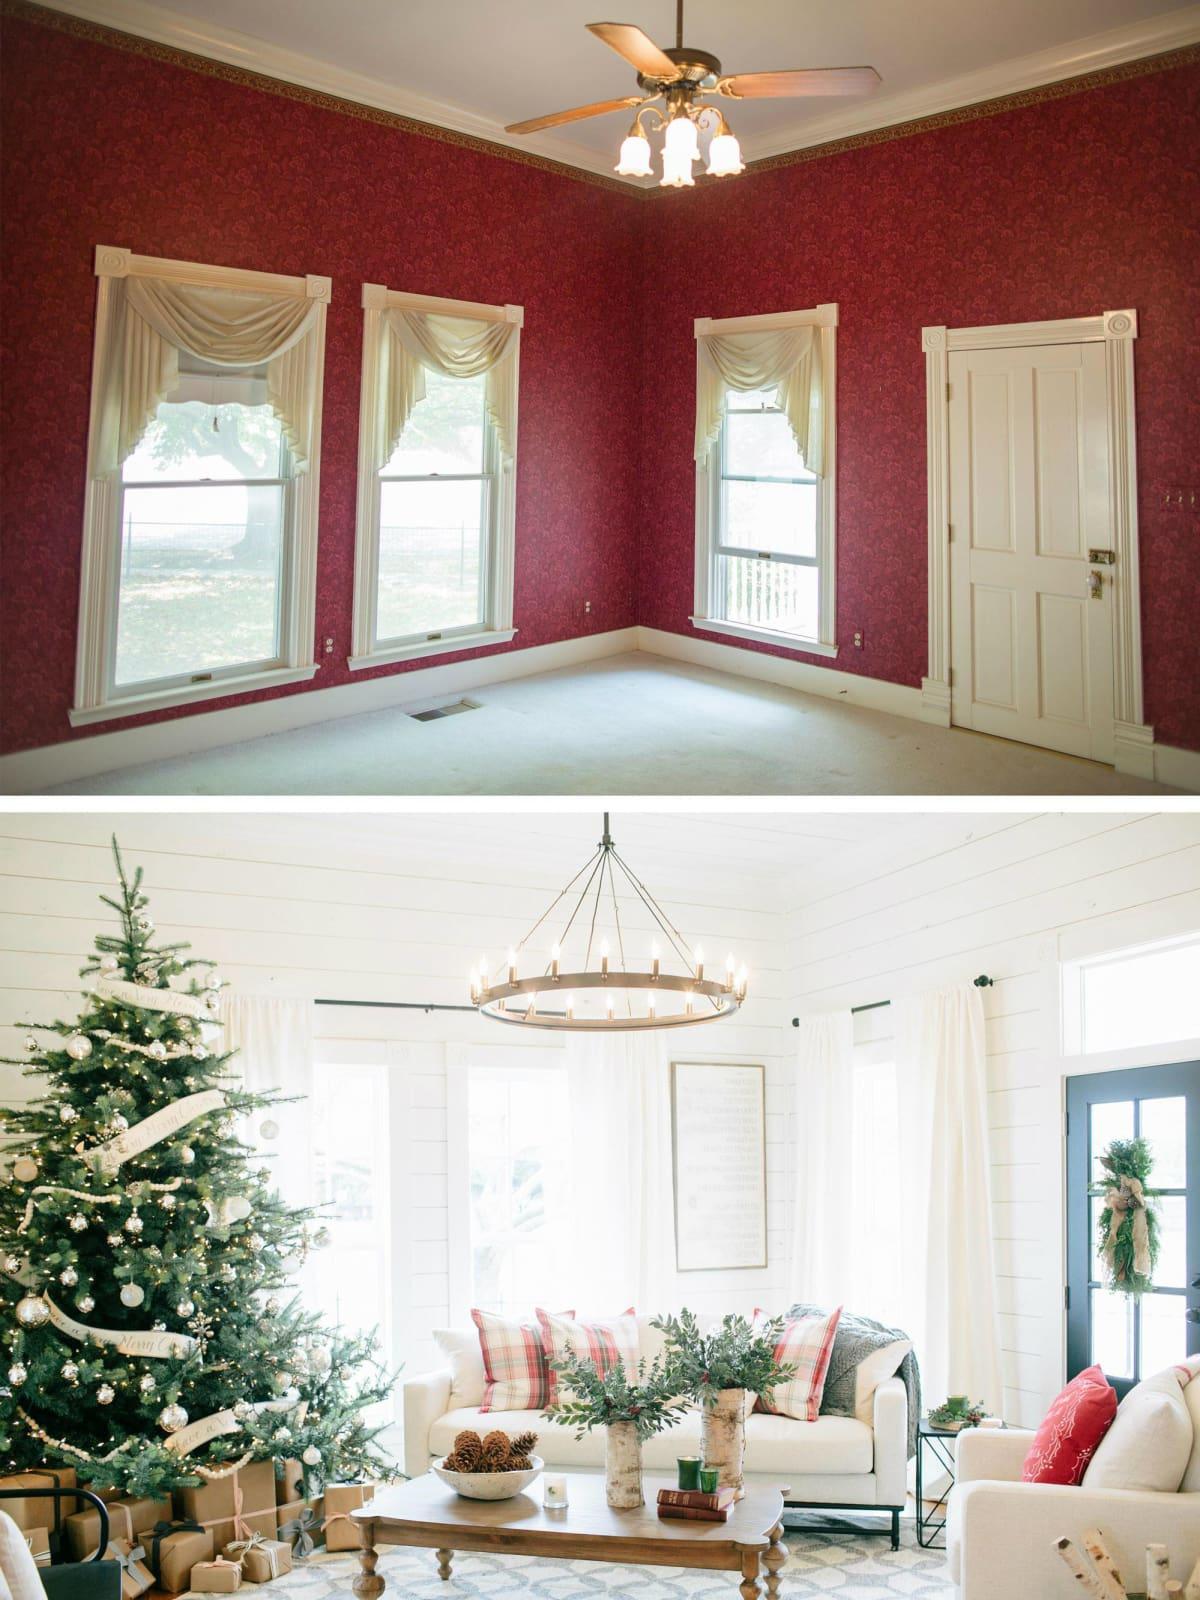 Magnolia House living room